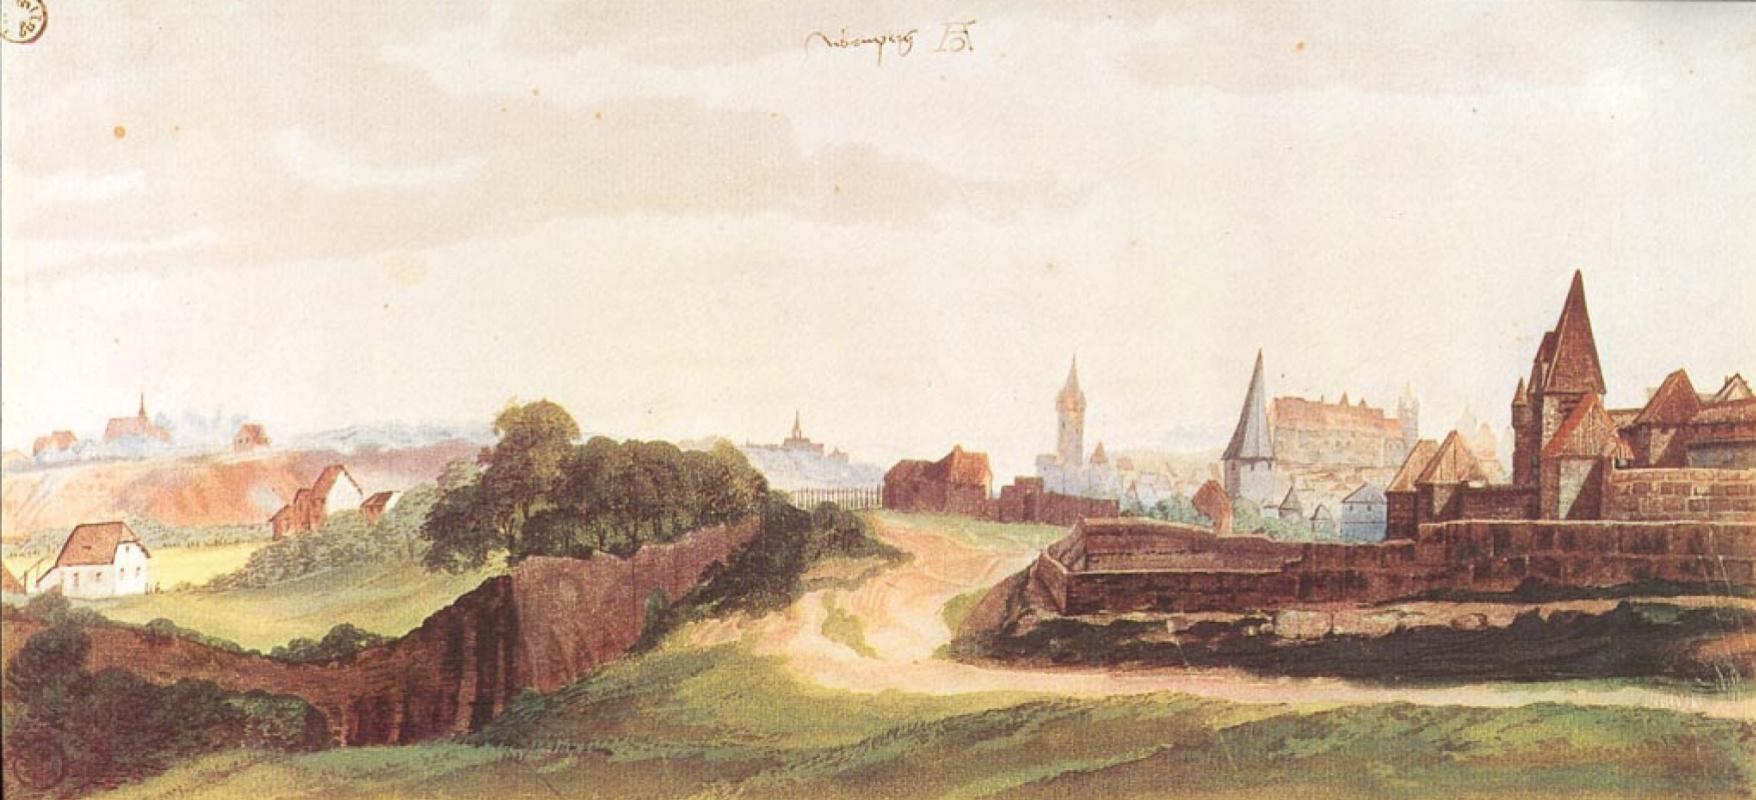 Albrecht Dürer. Nuremberg